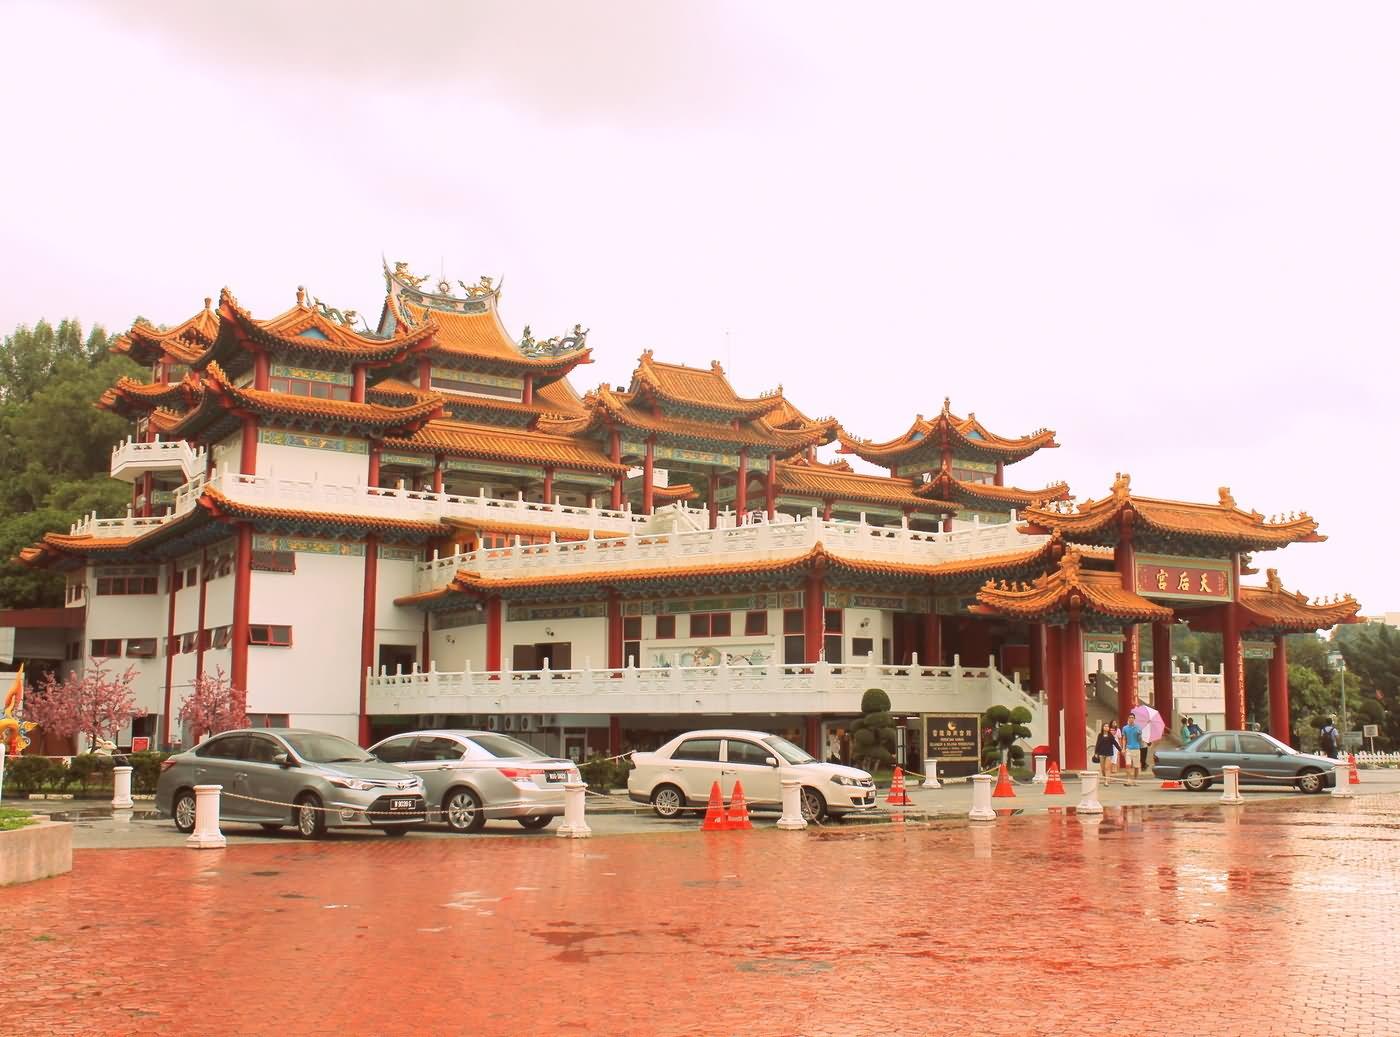 Kuala Lumpur Thean Hou Temple Exterior